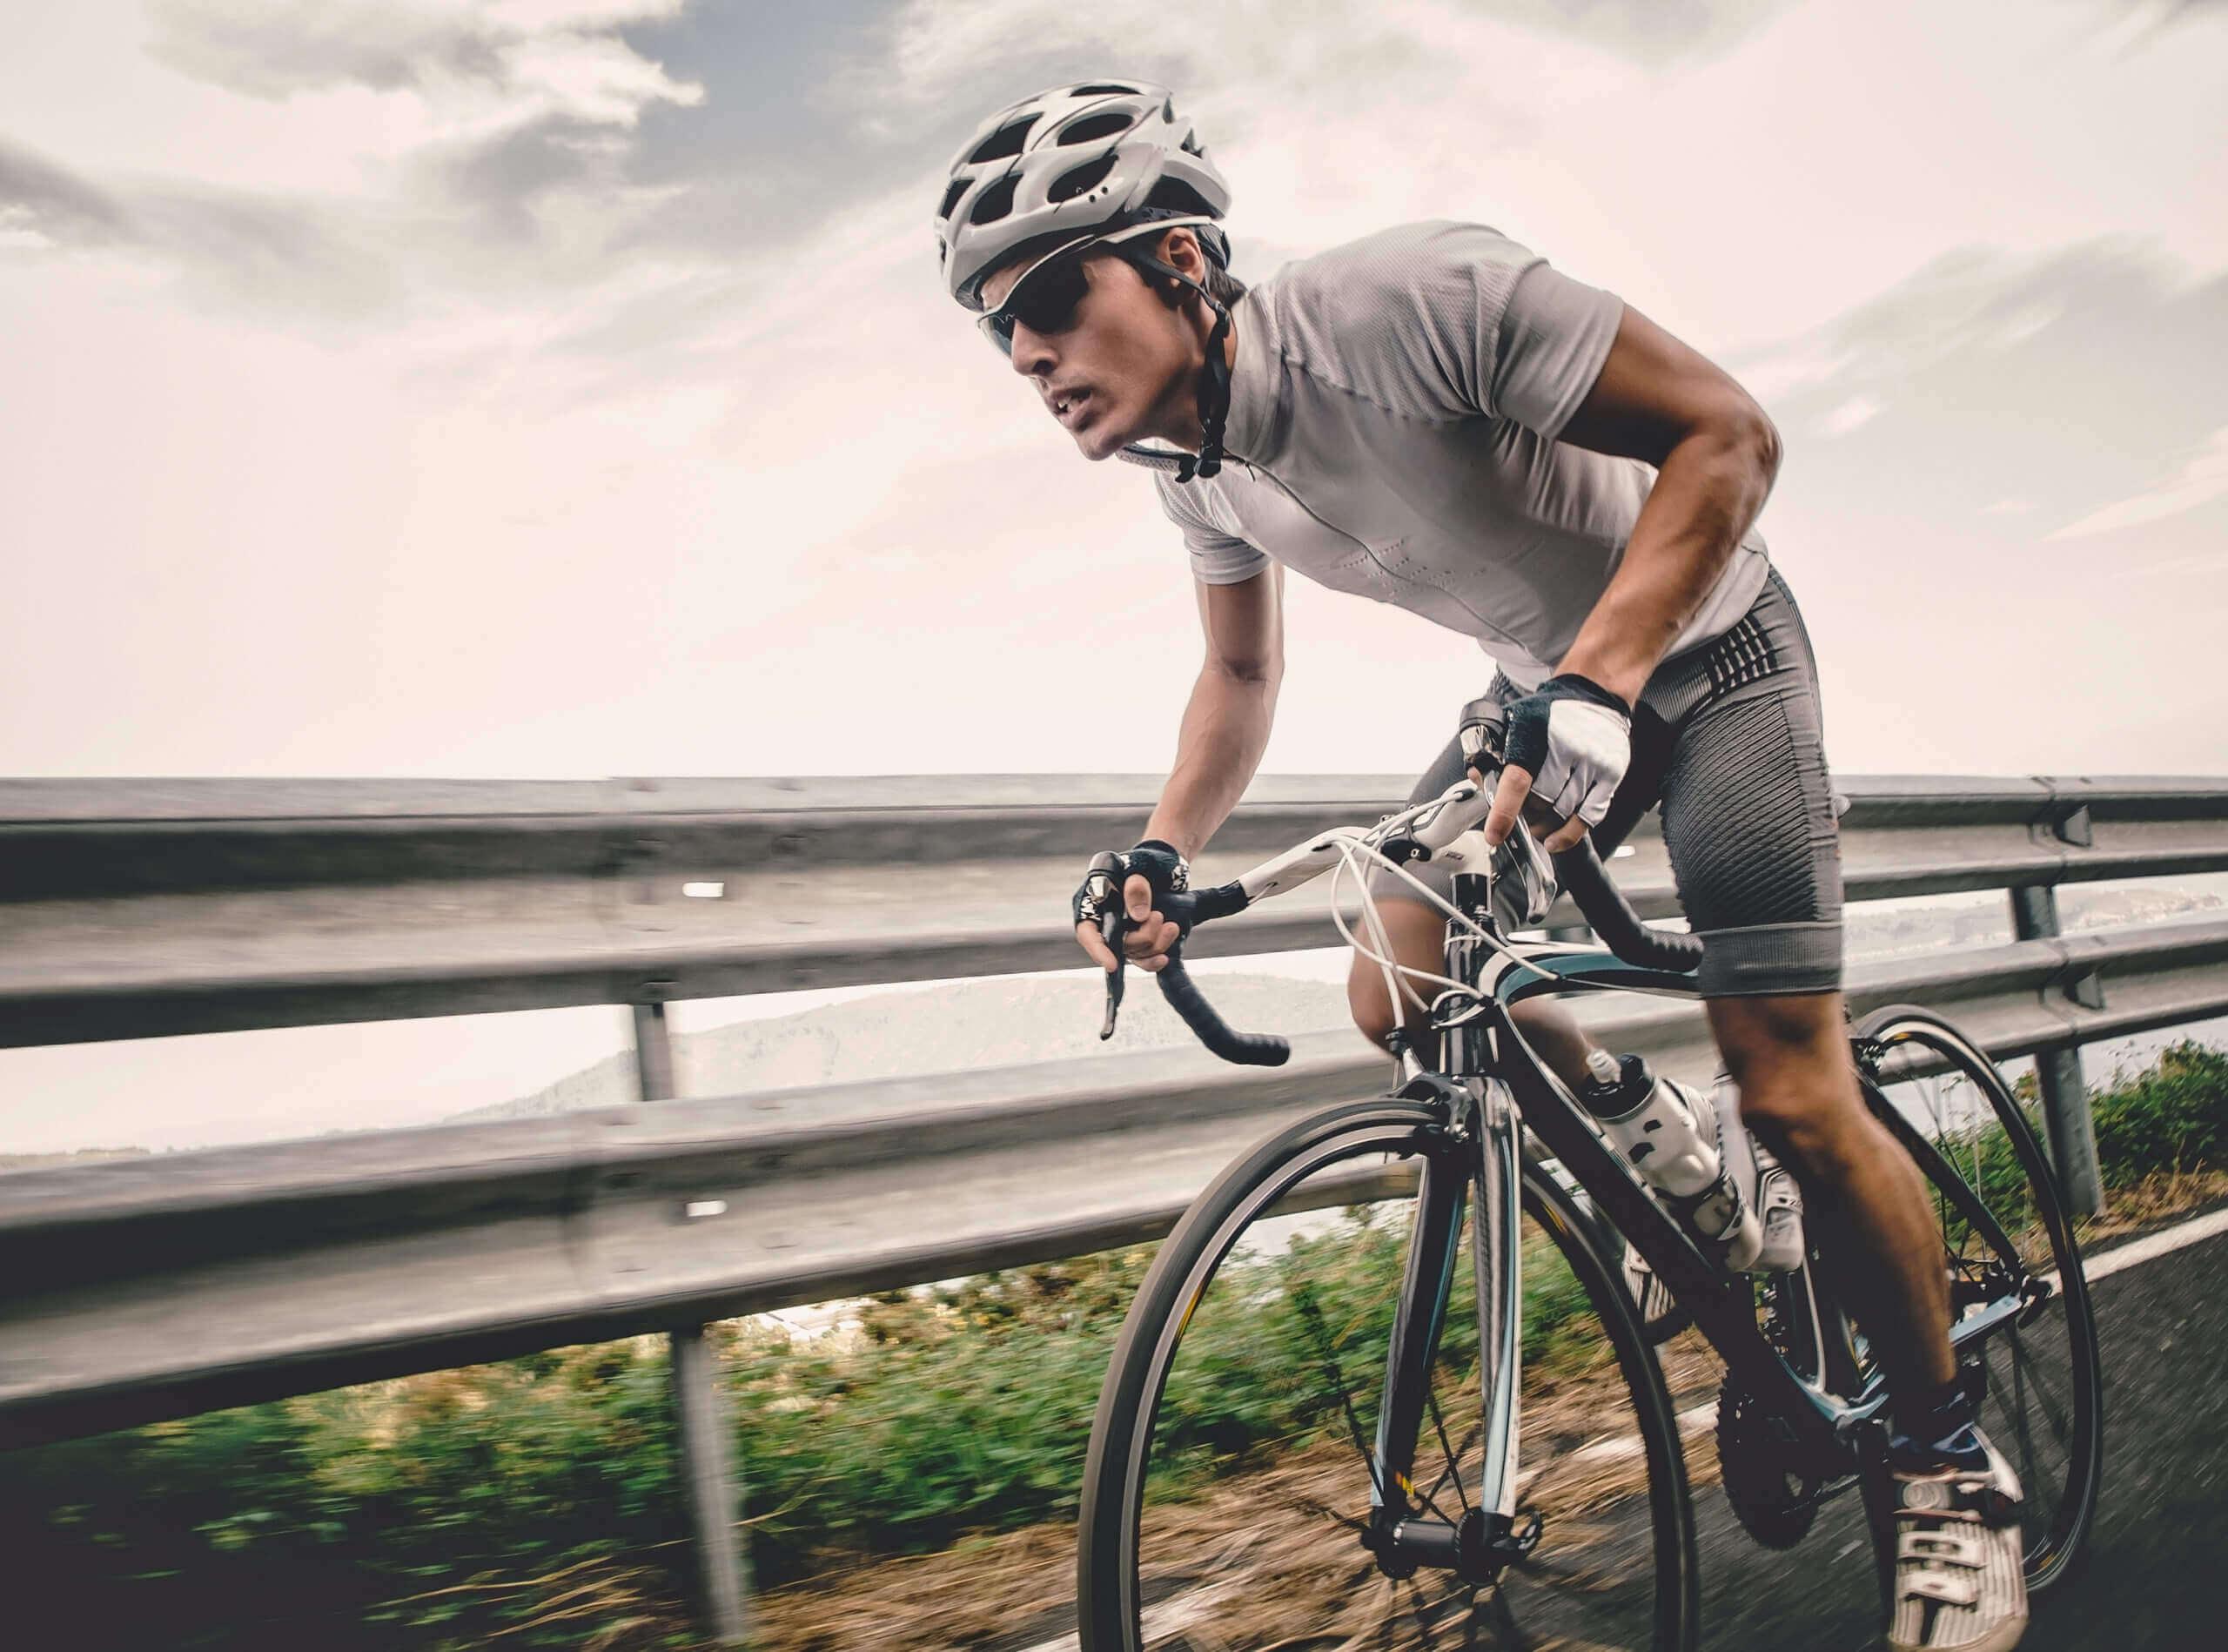 Sådan undgår du impotens ved at motionscykle